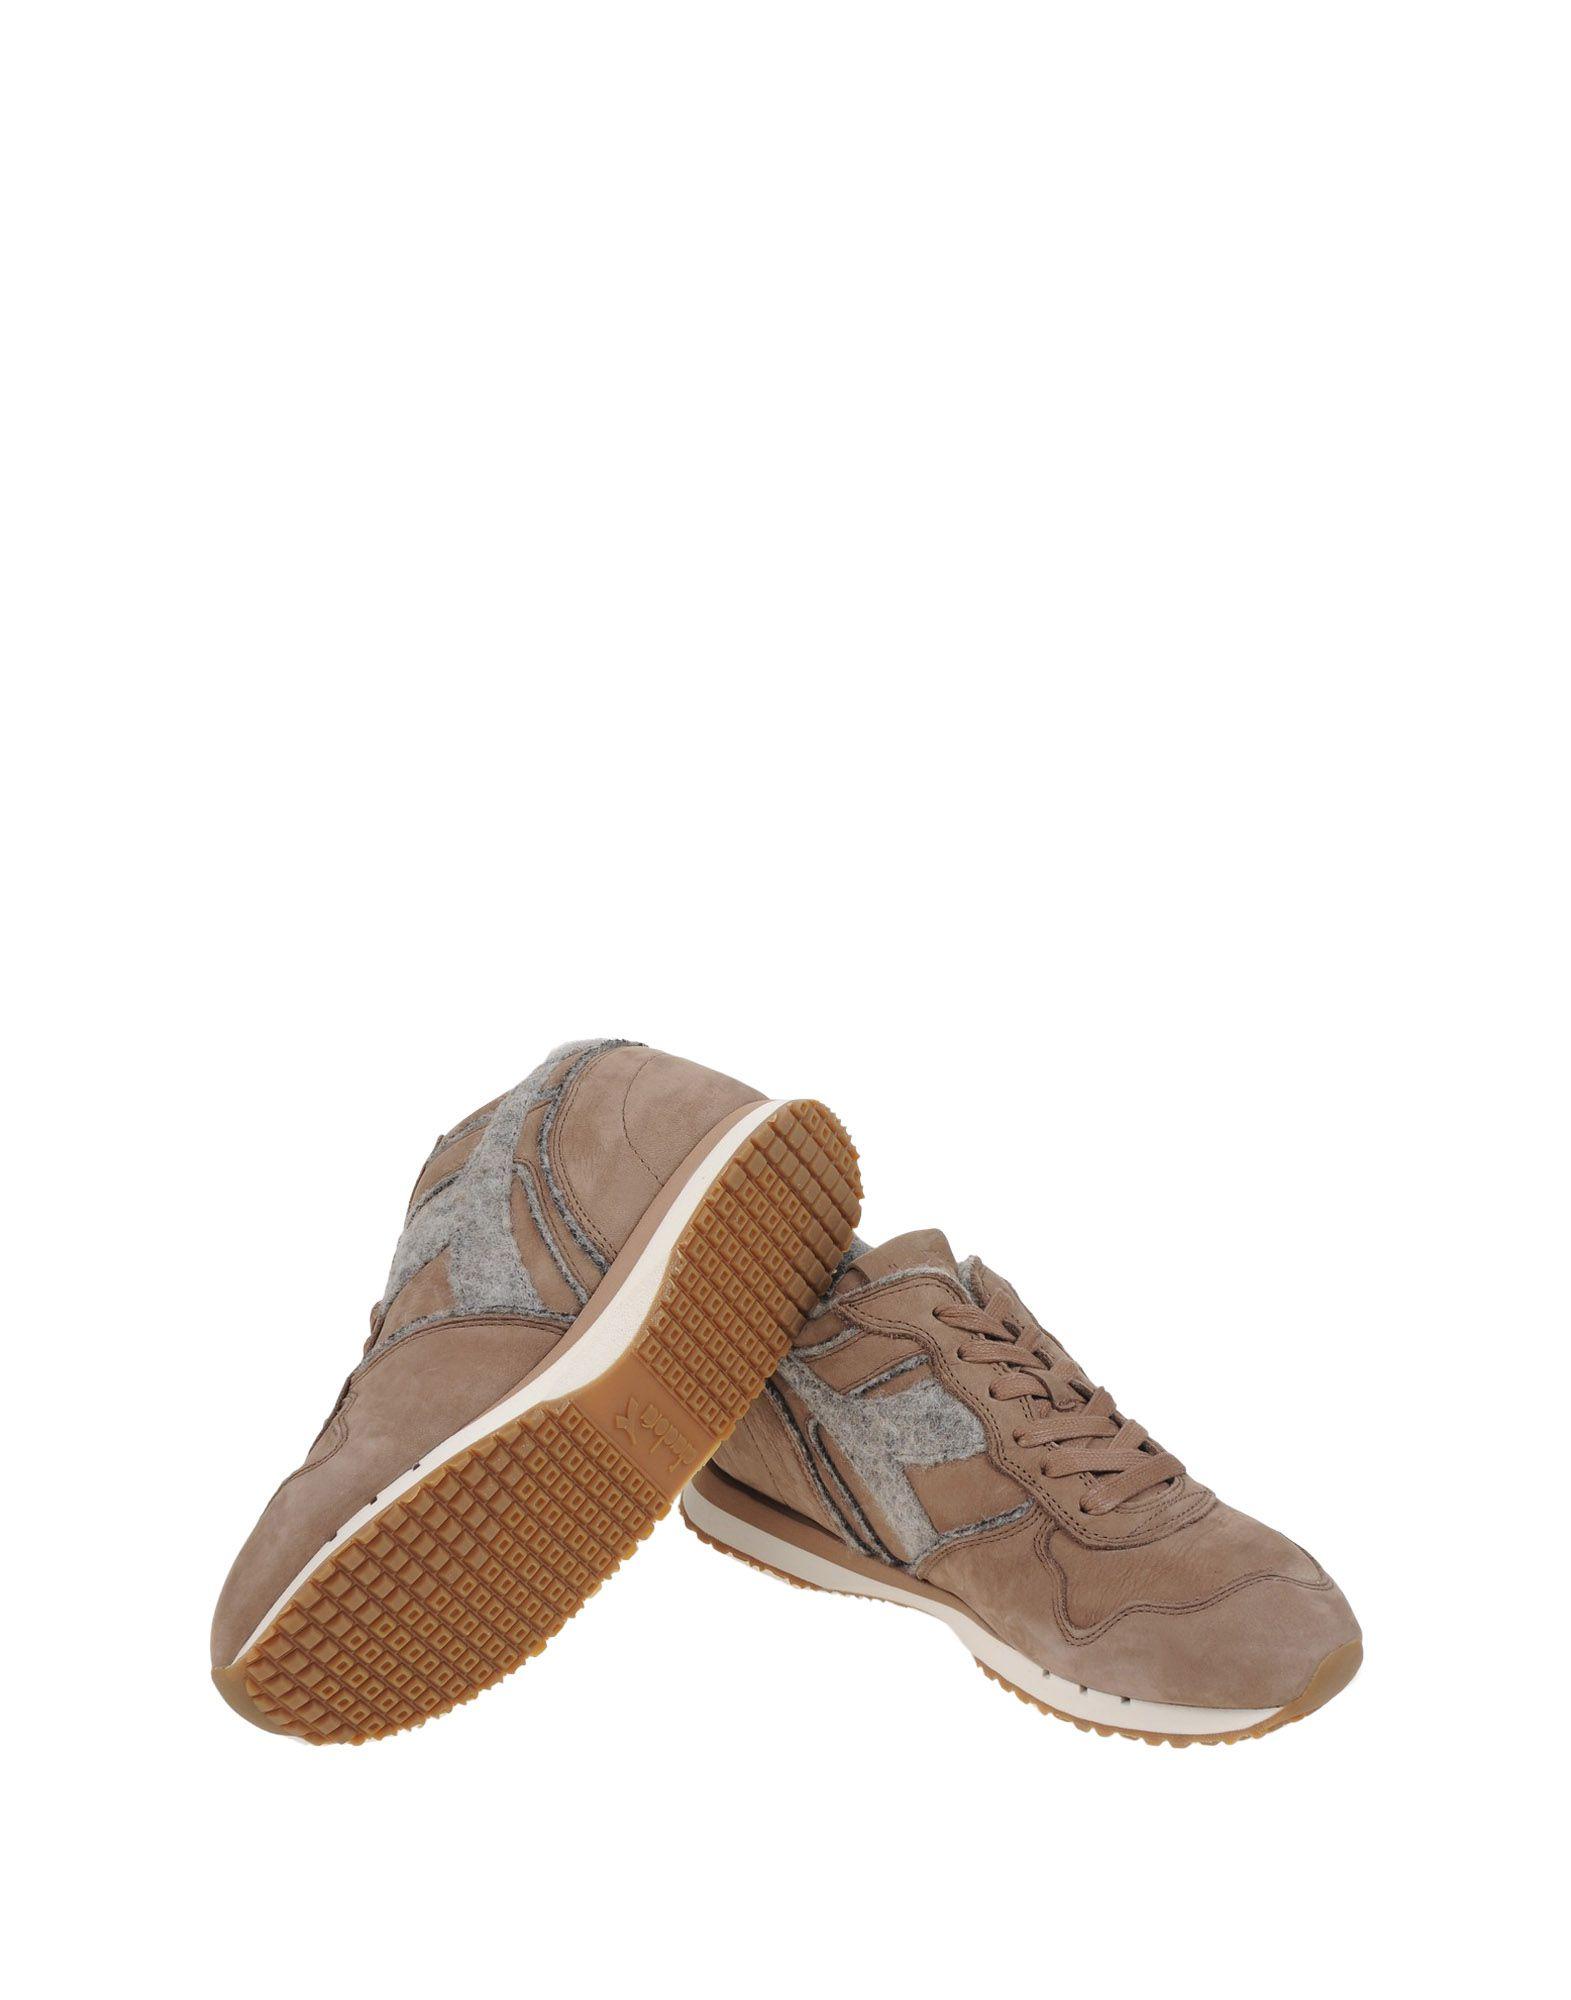 Sneakers Diadora Heritage Trident W Warm - Femme - Sneakers Diadora Heritage sur